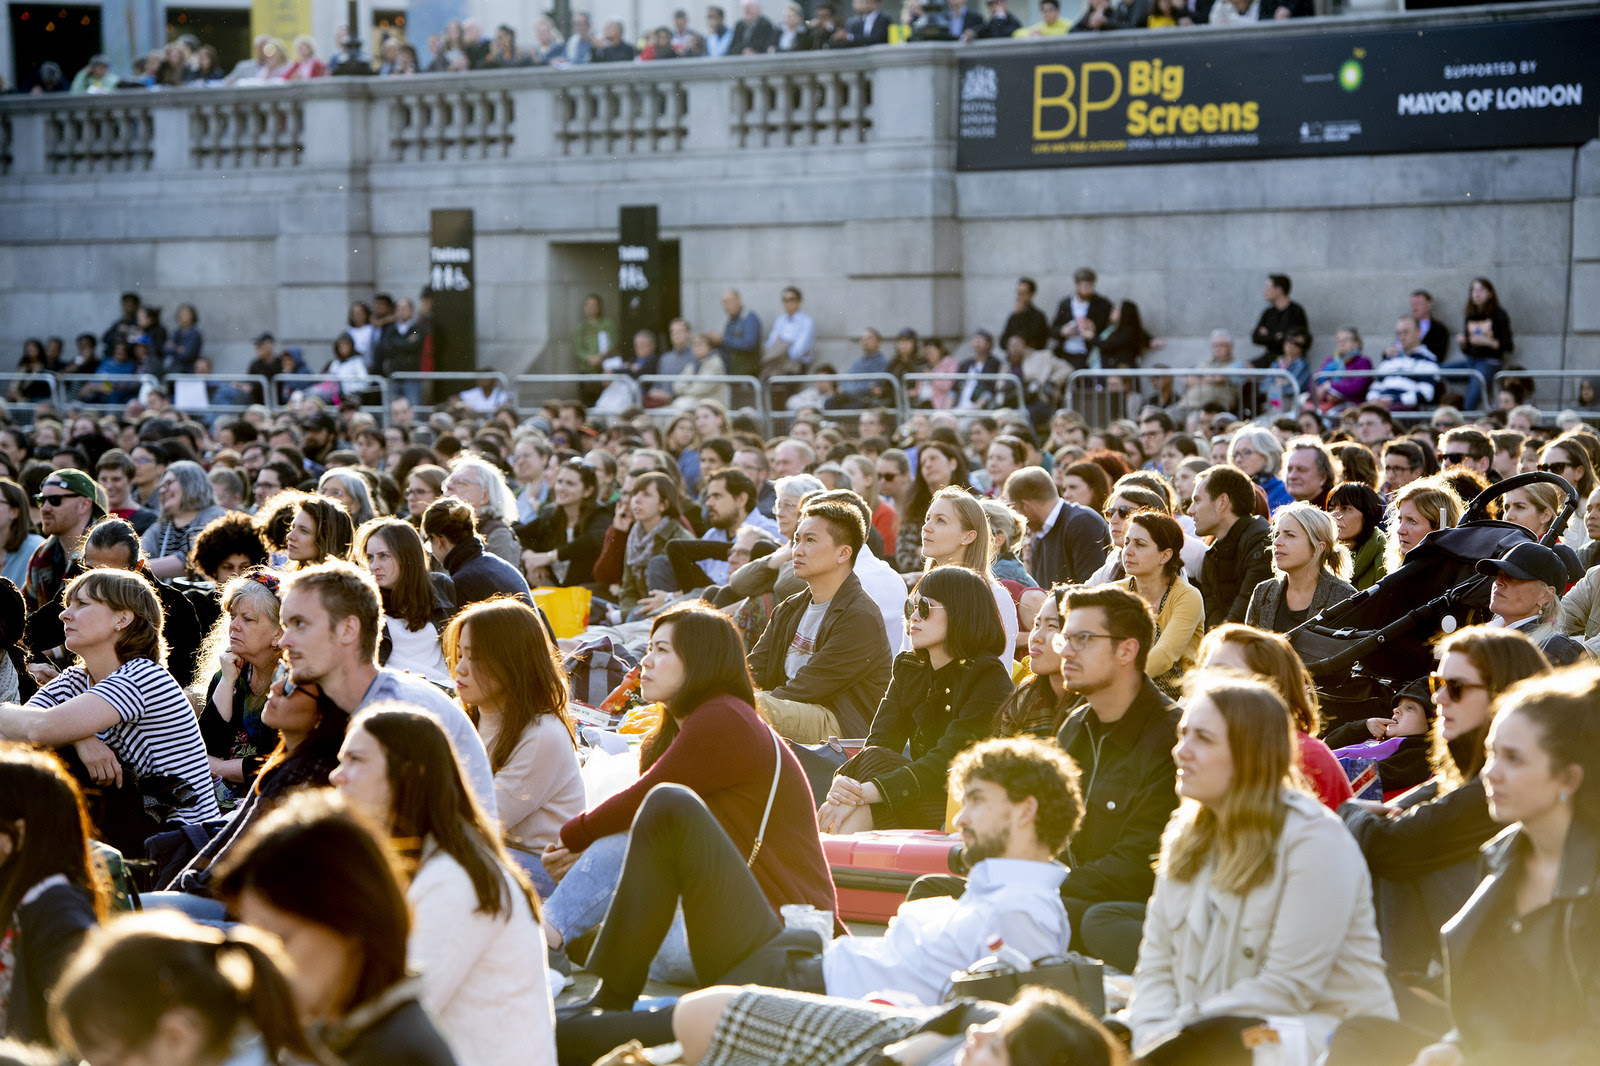 A Royal Opera House BP Big Screen, Trafalgar Square ©2018 ROH. Photographed by Sim Canetty-Clarke